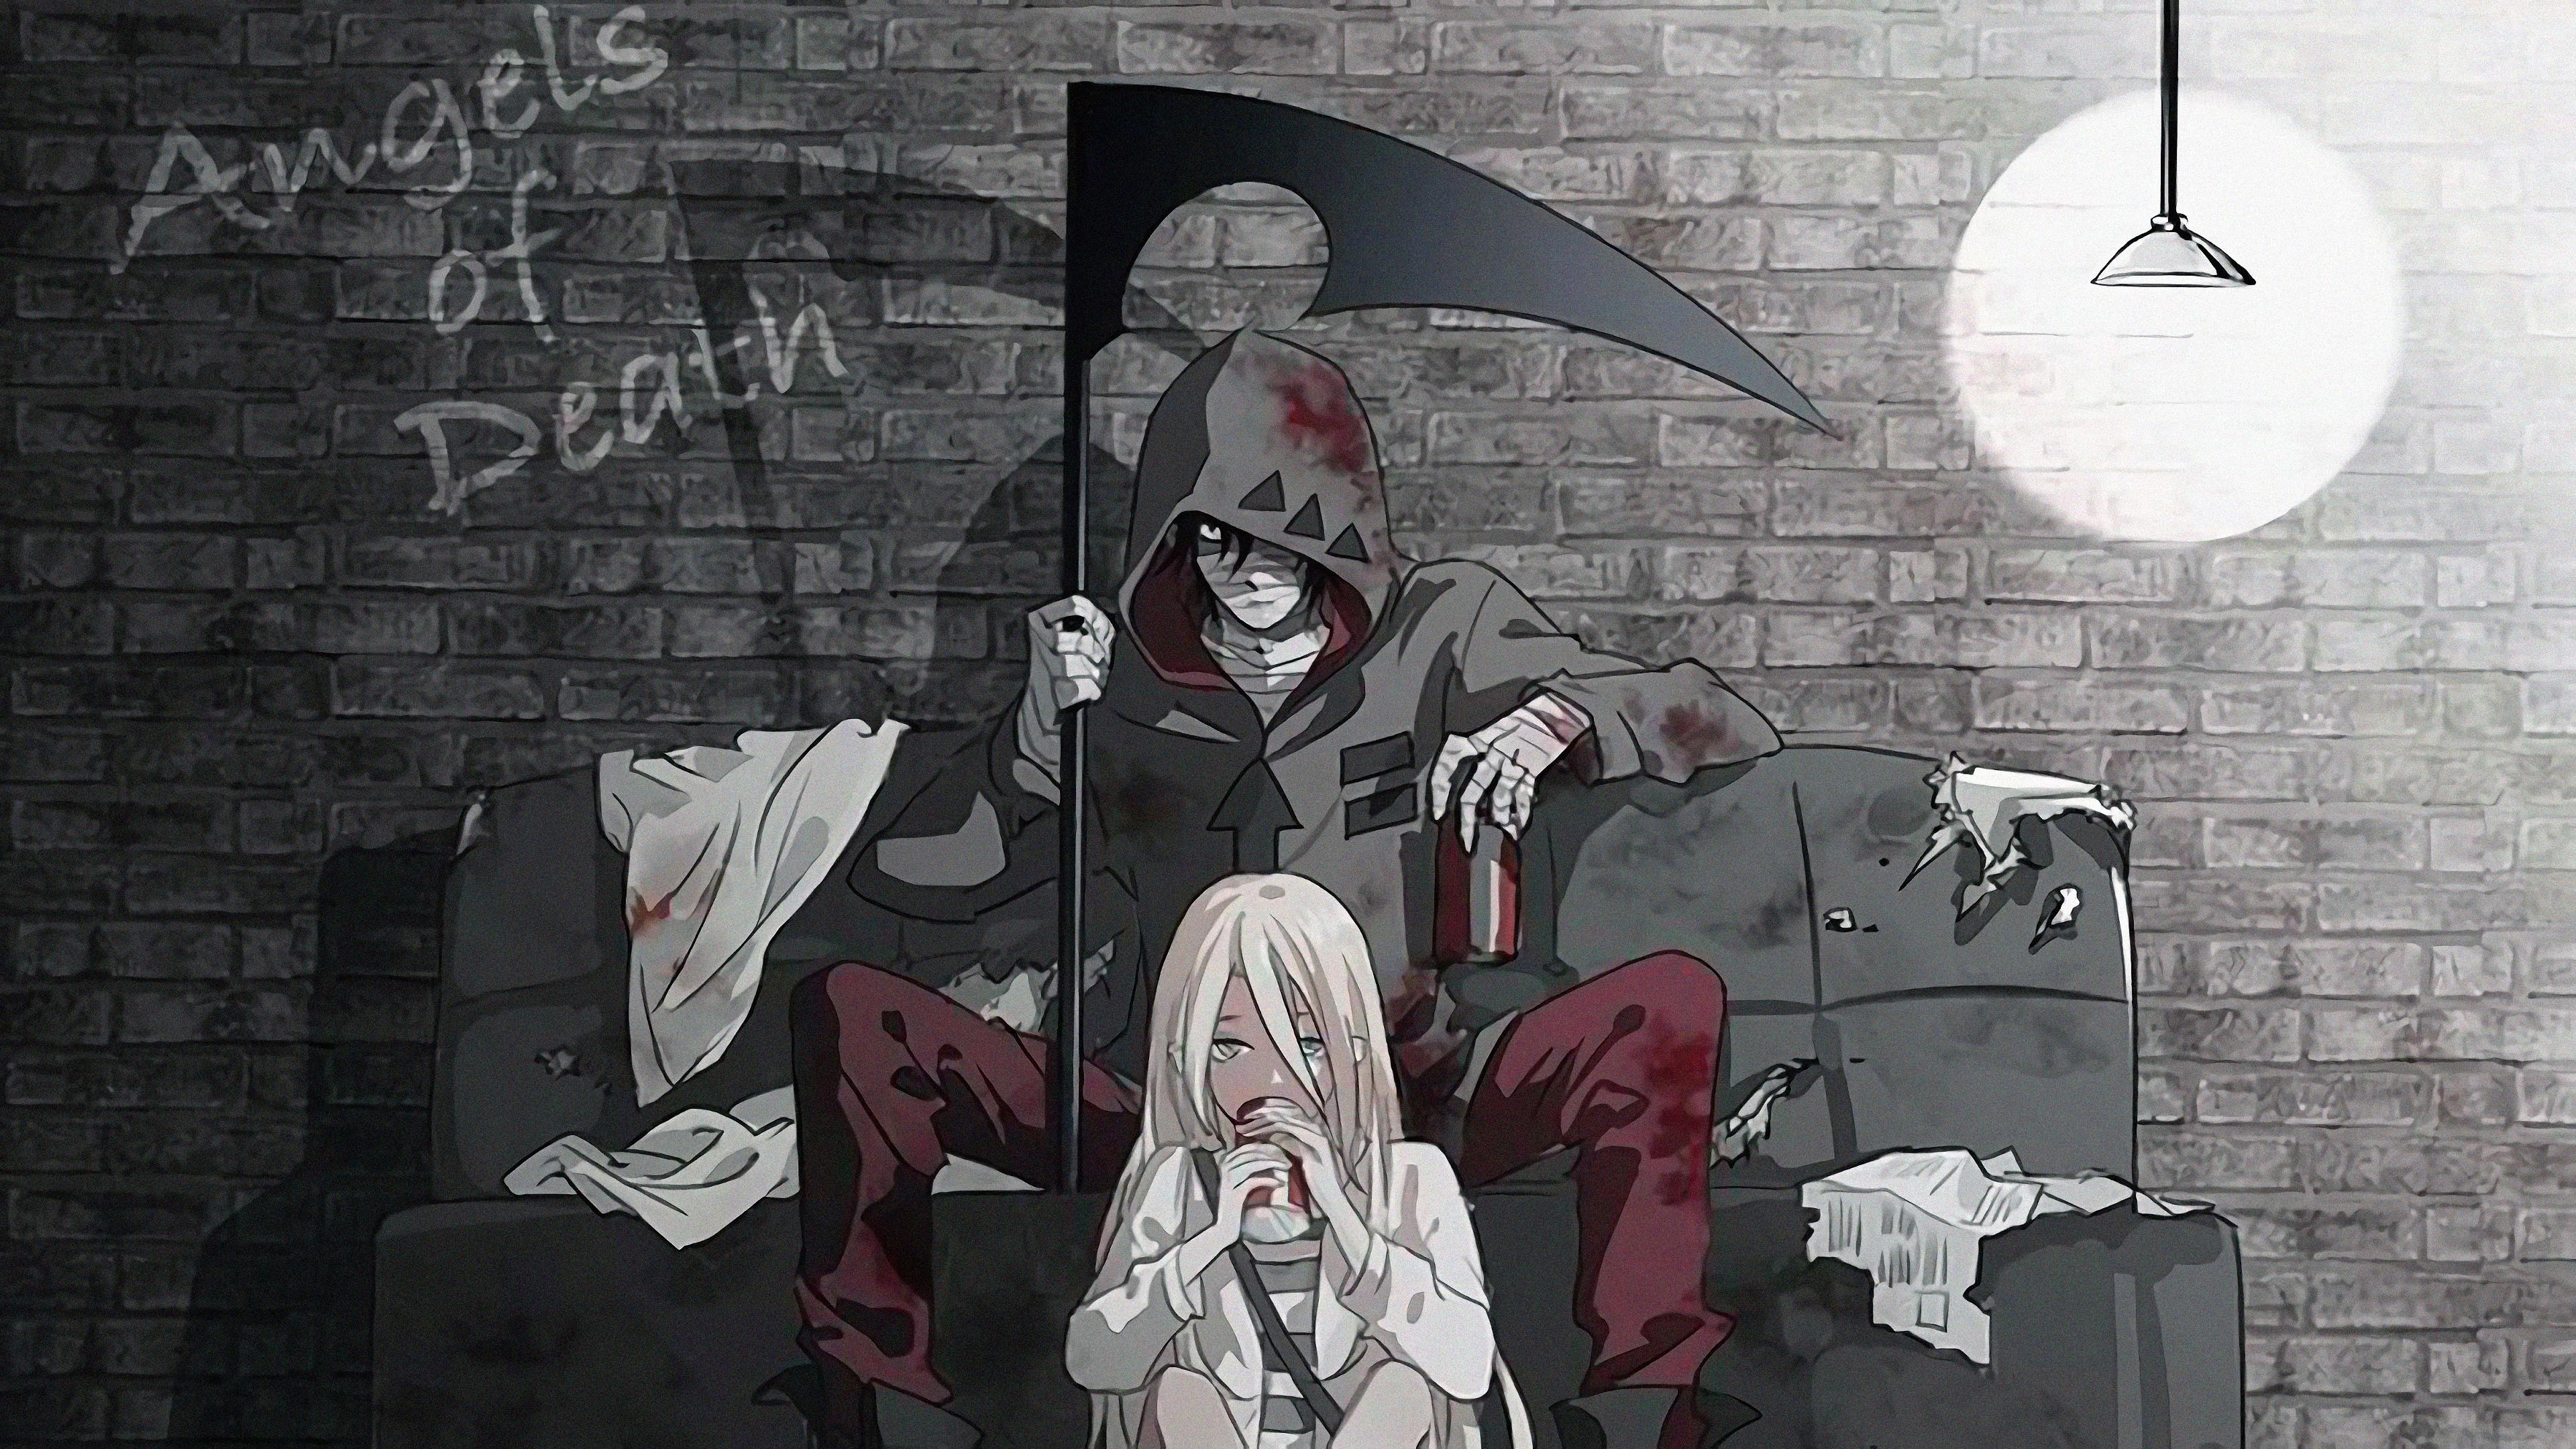 Zack Isaac Foster Rachel Gardner Angels of Death Satsuriku no 3840x2160